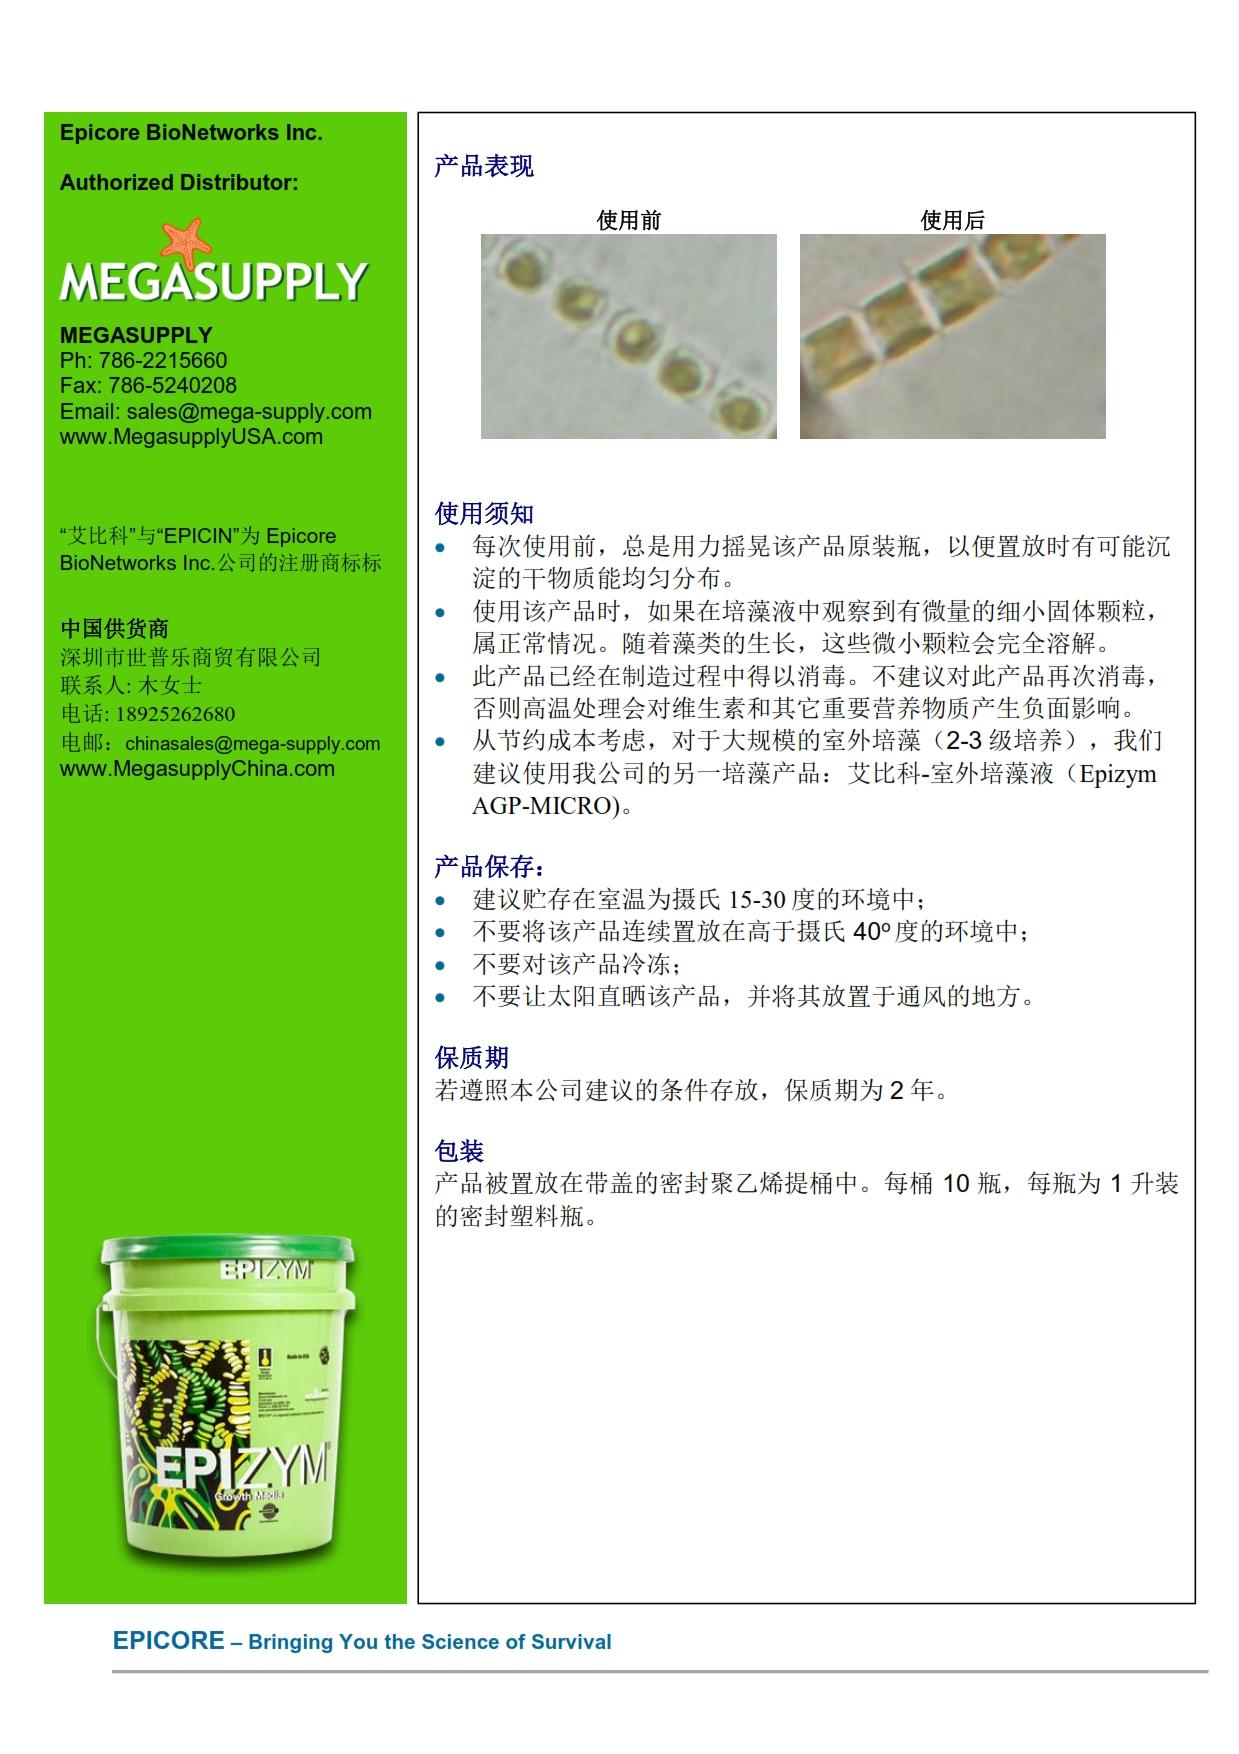 EPIZYM-AGP-C-2014-cn1-V3-web_002